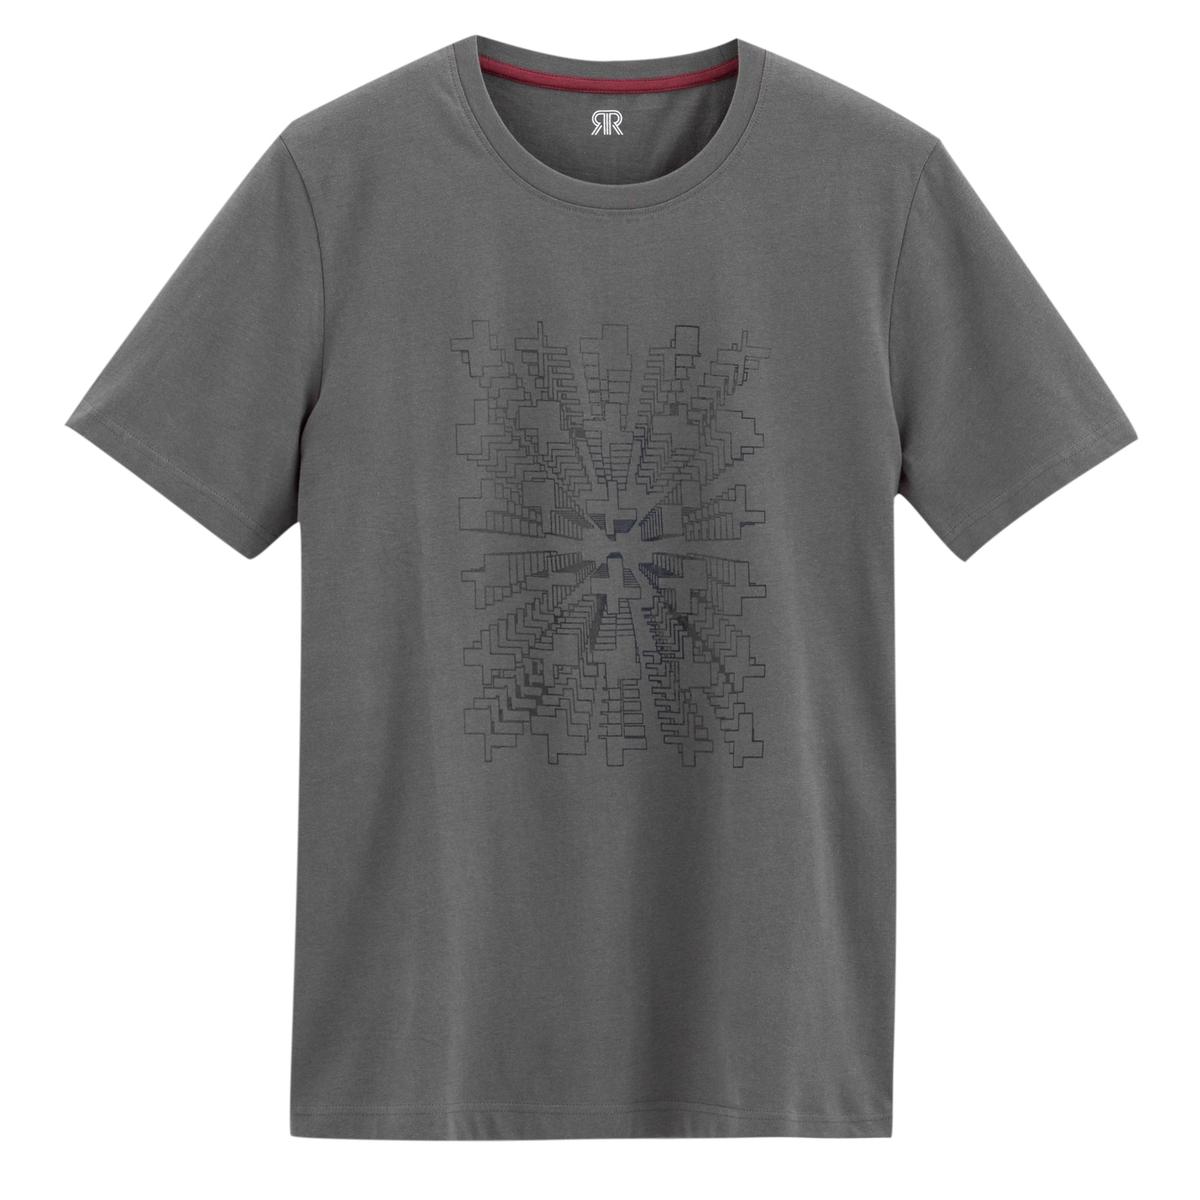 T-shirt estampada de gola redonda, mangas curtas